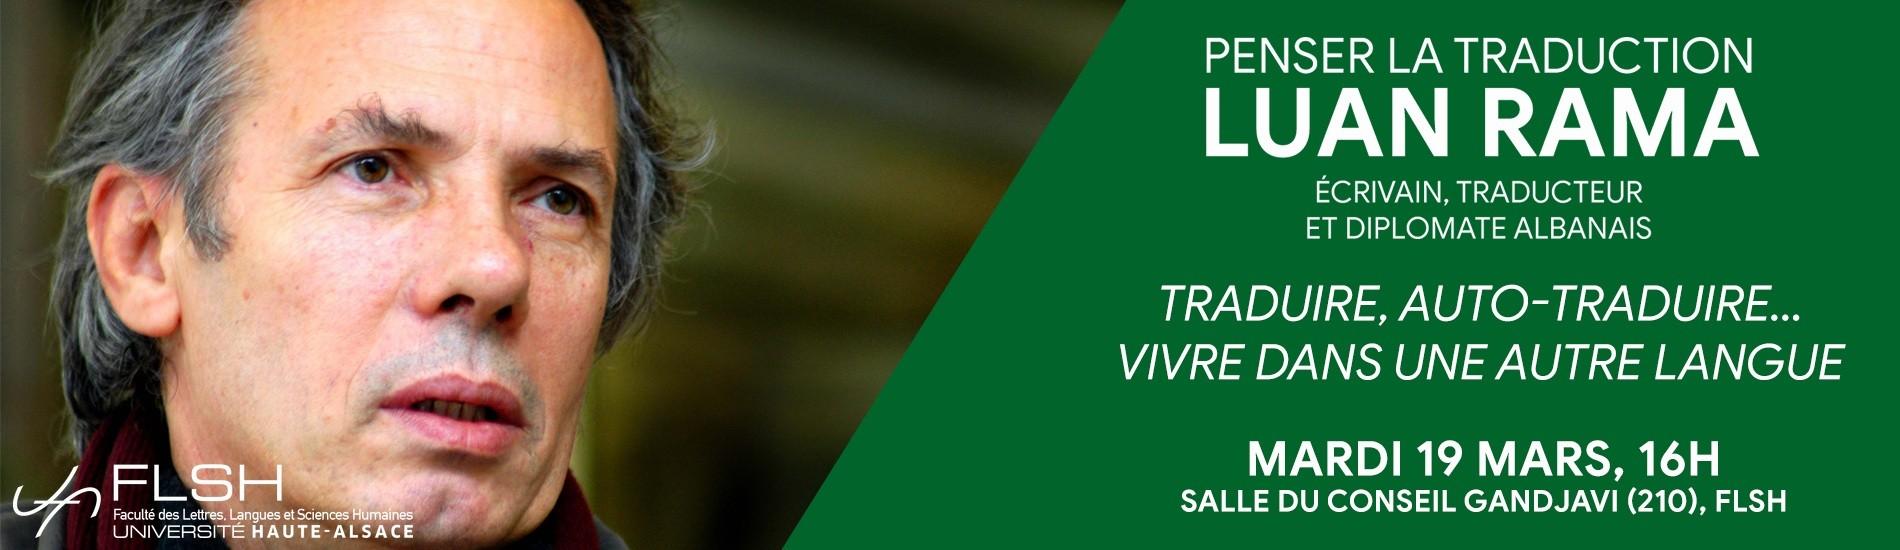 EVENT – Penser la Traduction – Luan Rama